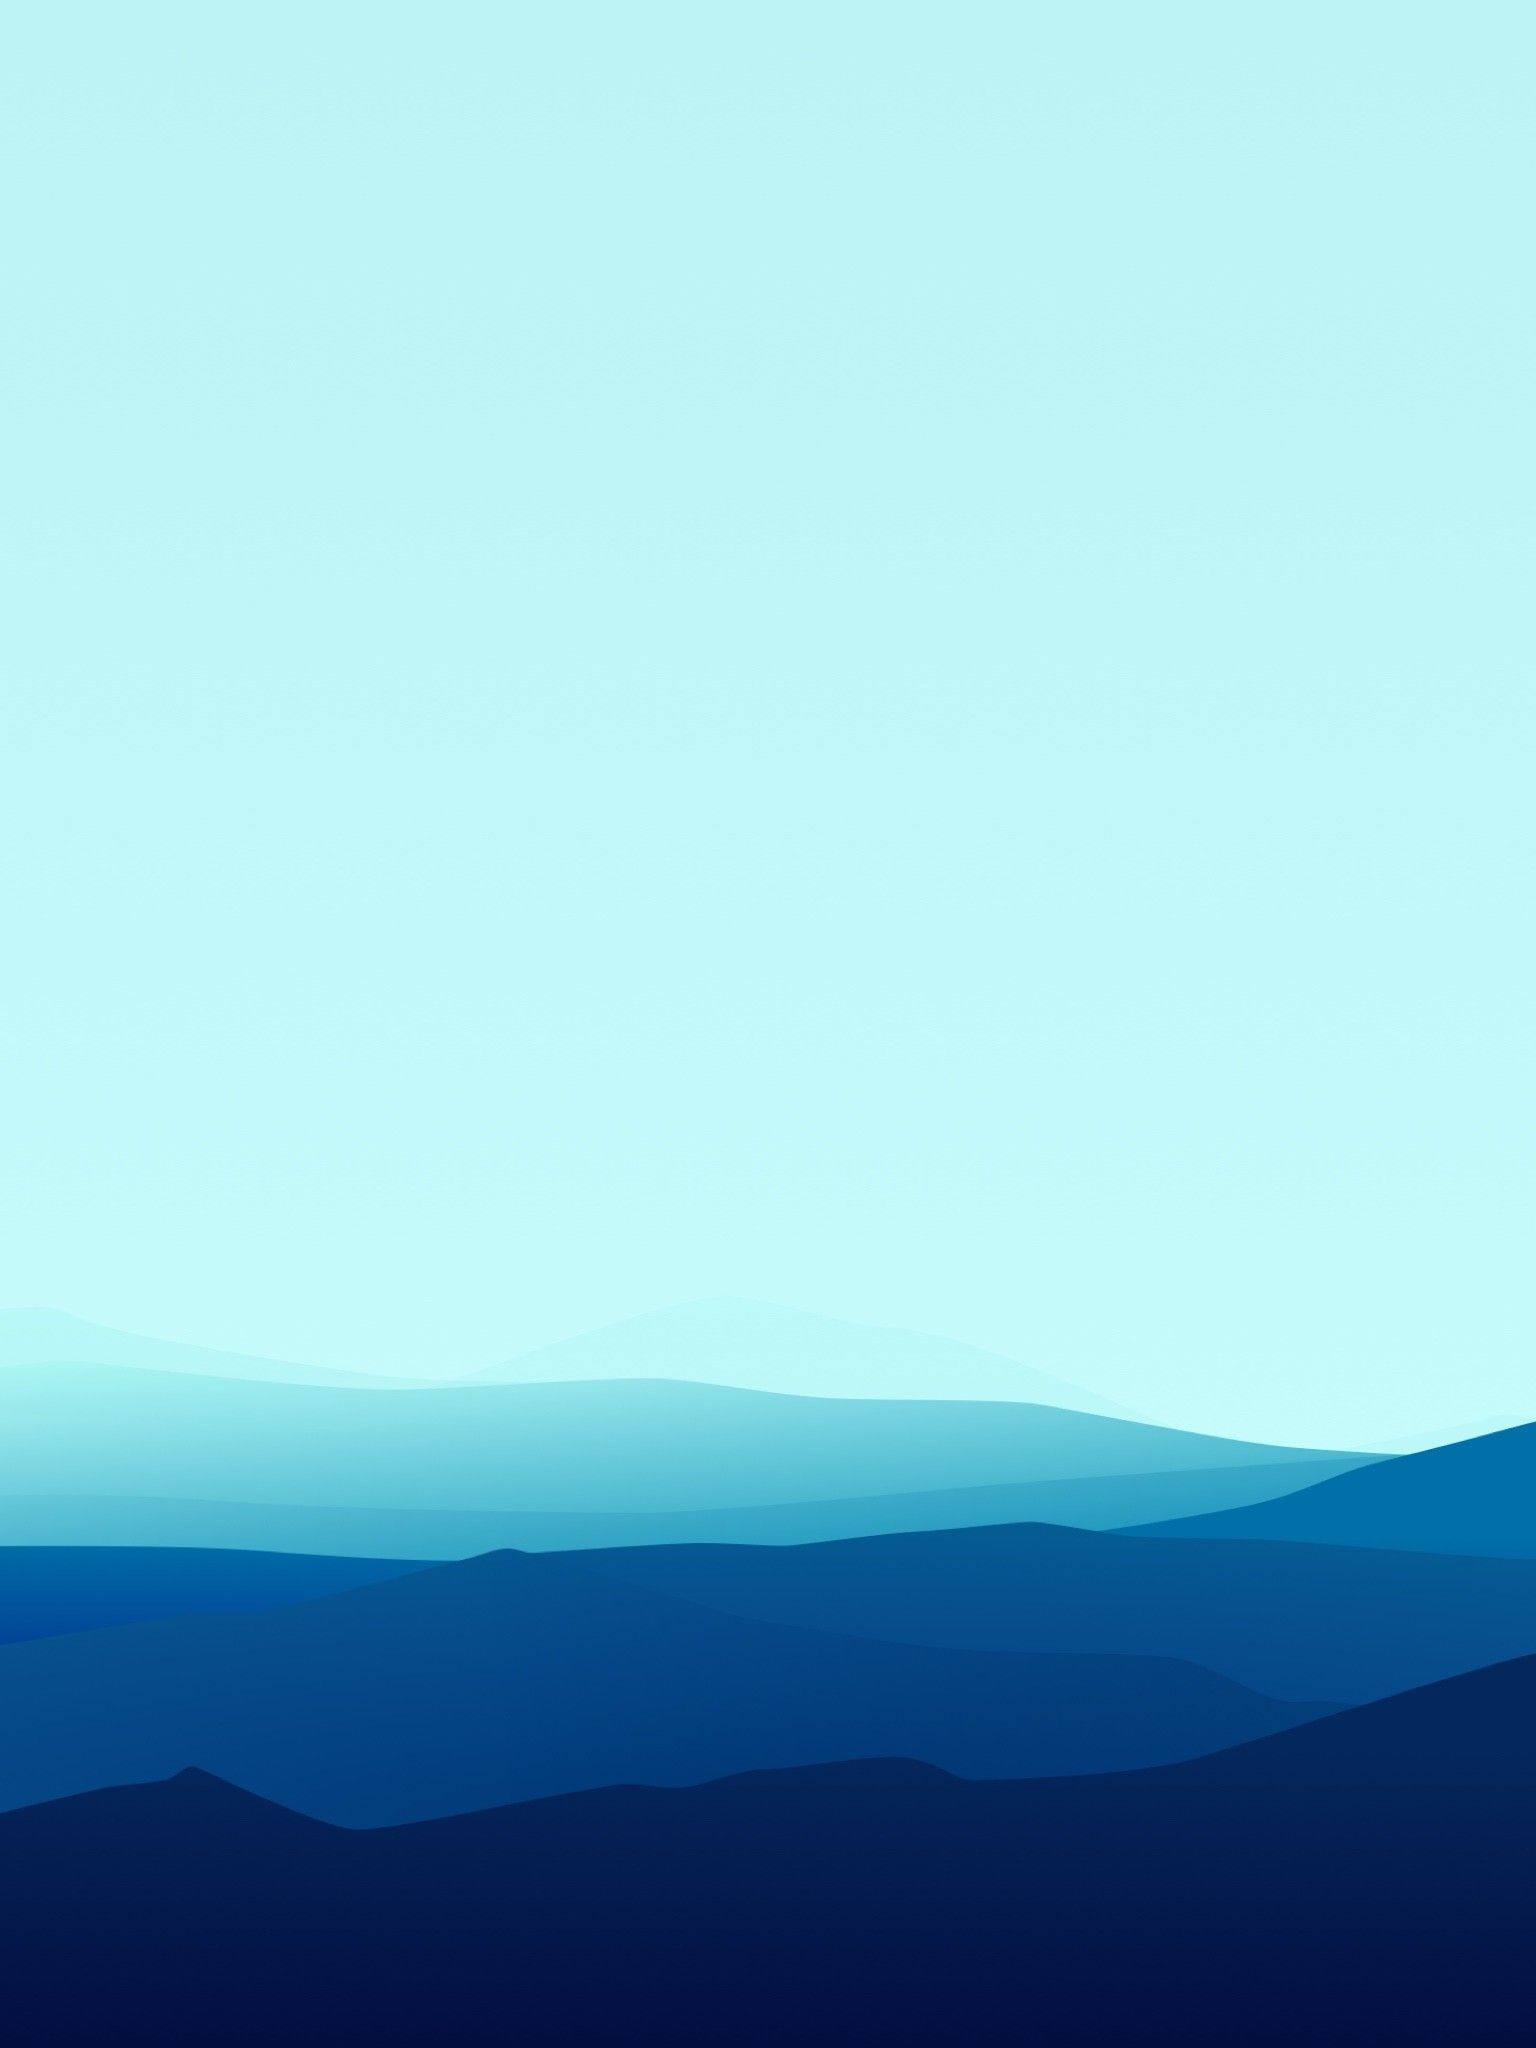 Blue Minimalist Wallpapers - Wallpaper Cave